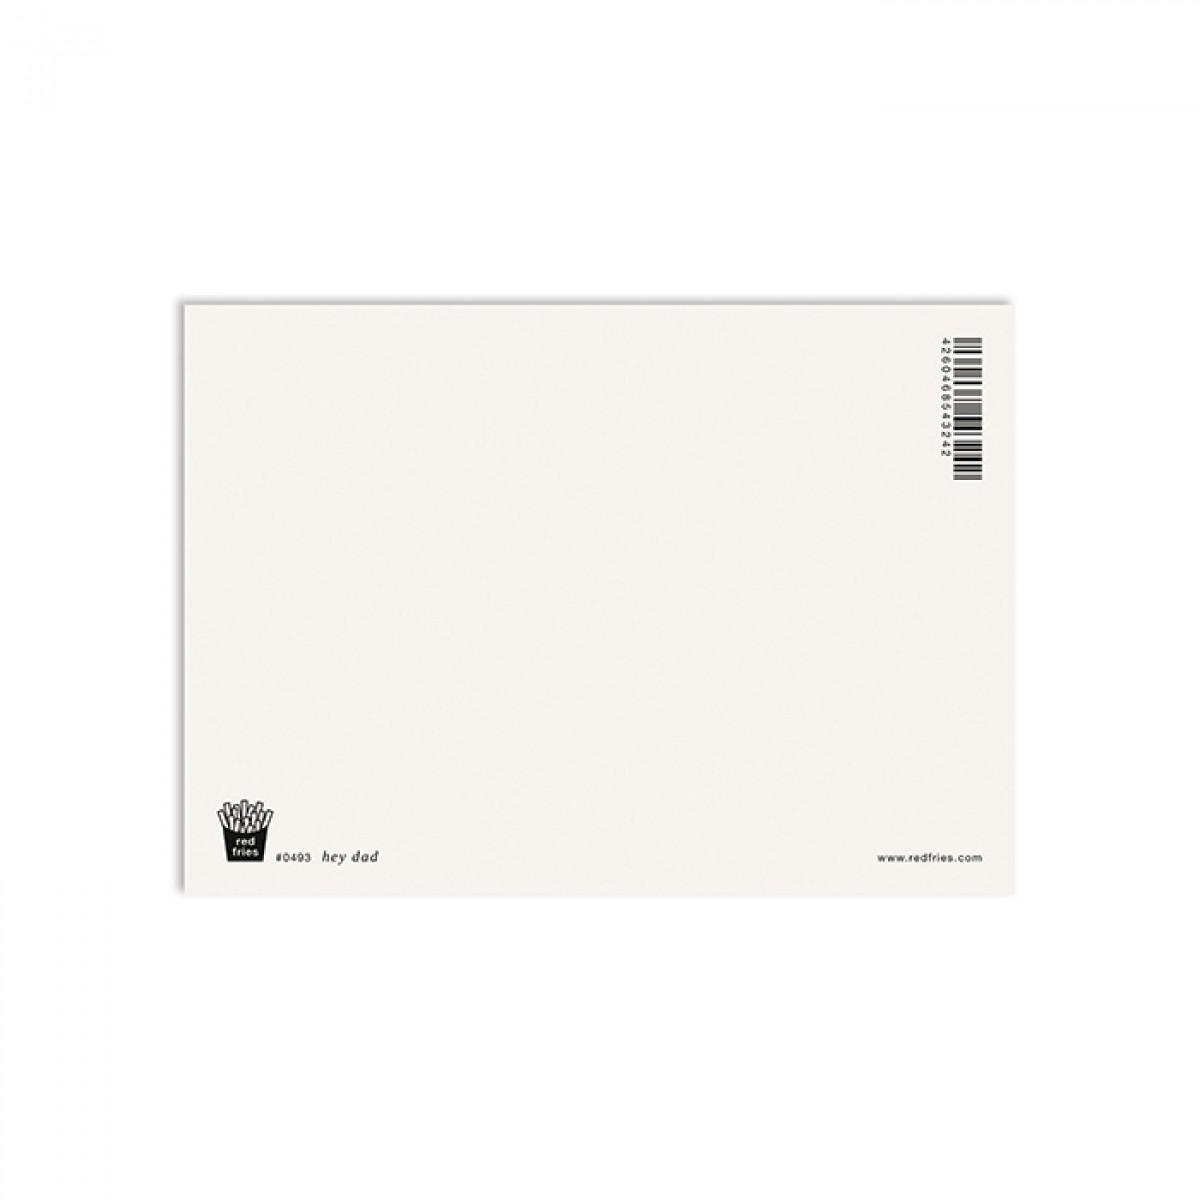 redfries hey dad –Postkarte DIN A6 Vatertag